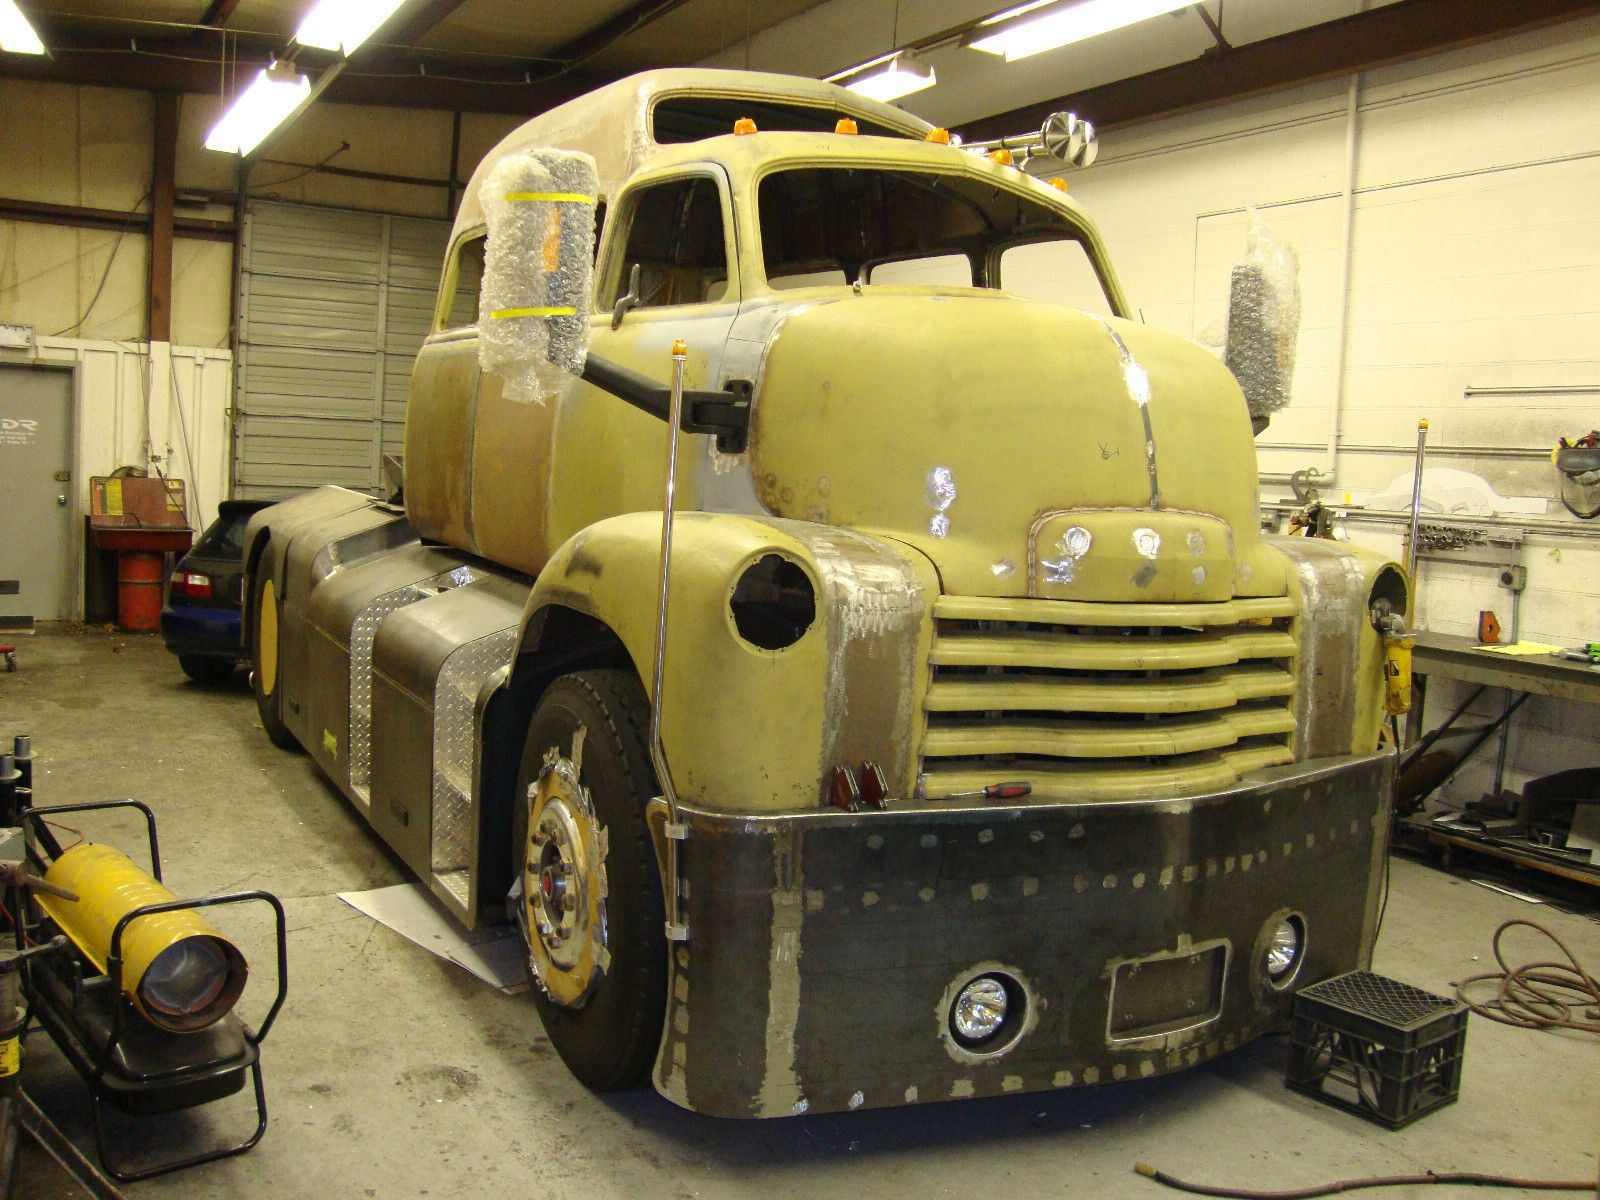 Vintage chevrolet c o e cab over engine truck chevrolet for Truck motors for sale